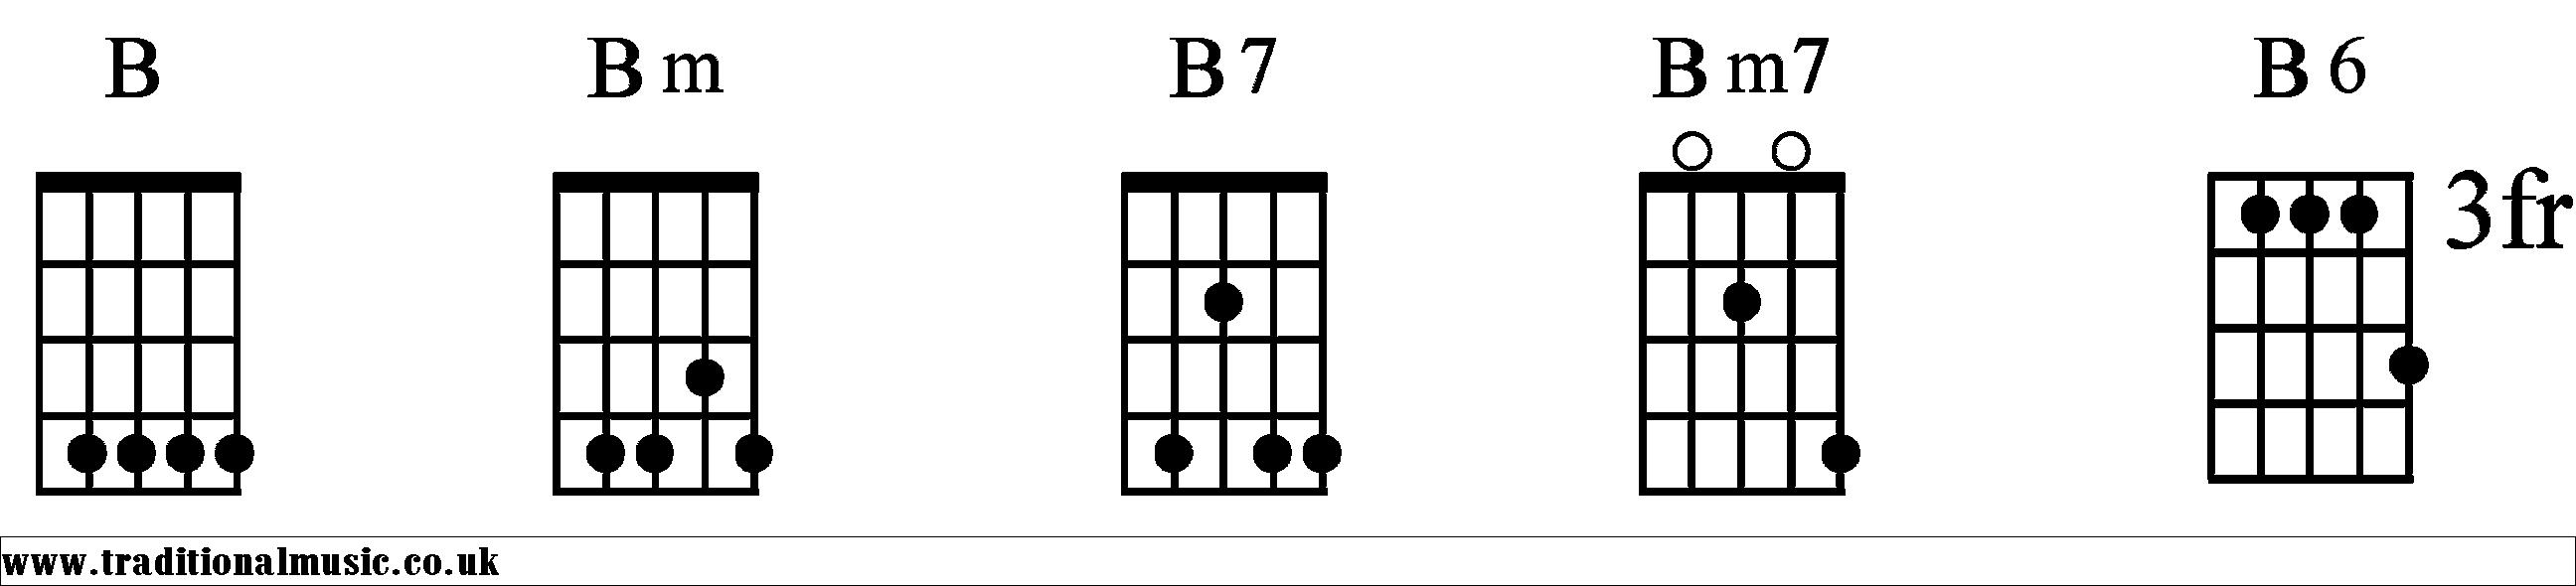 B Minor Guitar Chord Easy